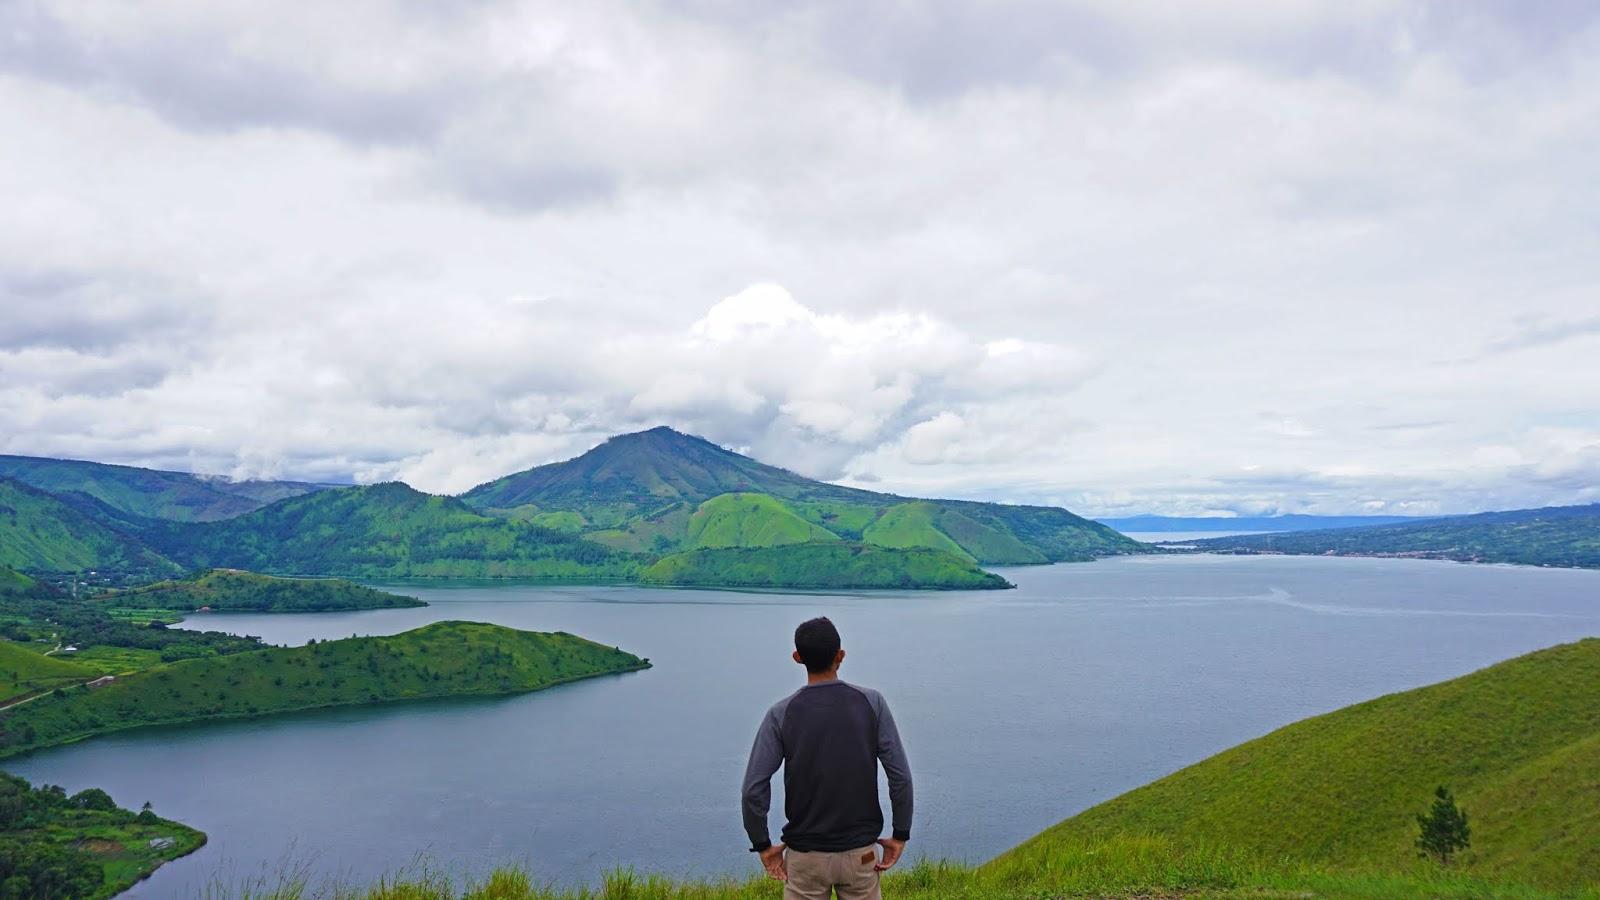 Danau-Toba-dari-Bukit-Holbung.jpg